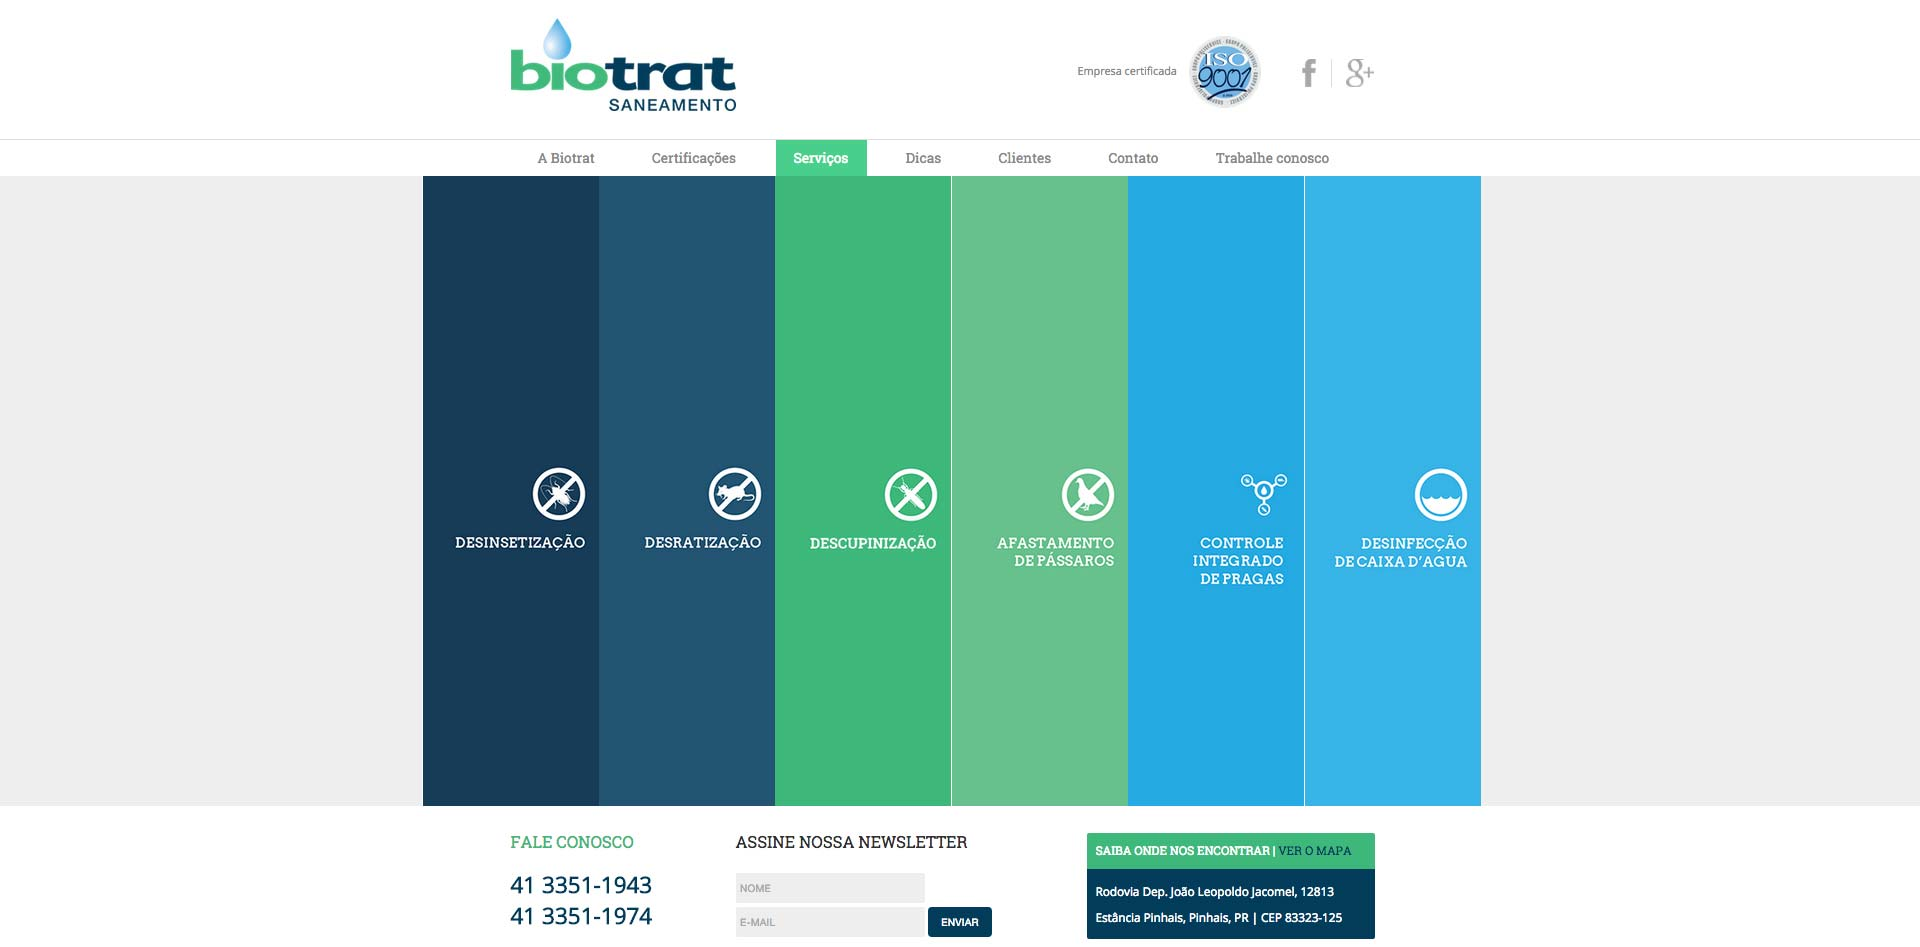 4-BIOTRAT